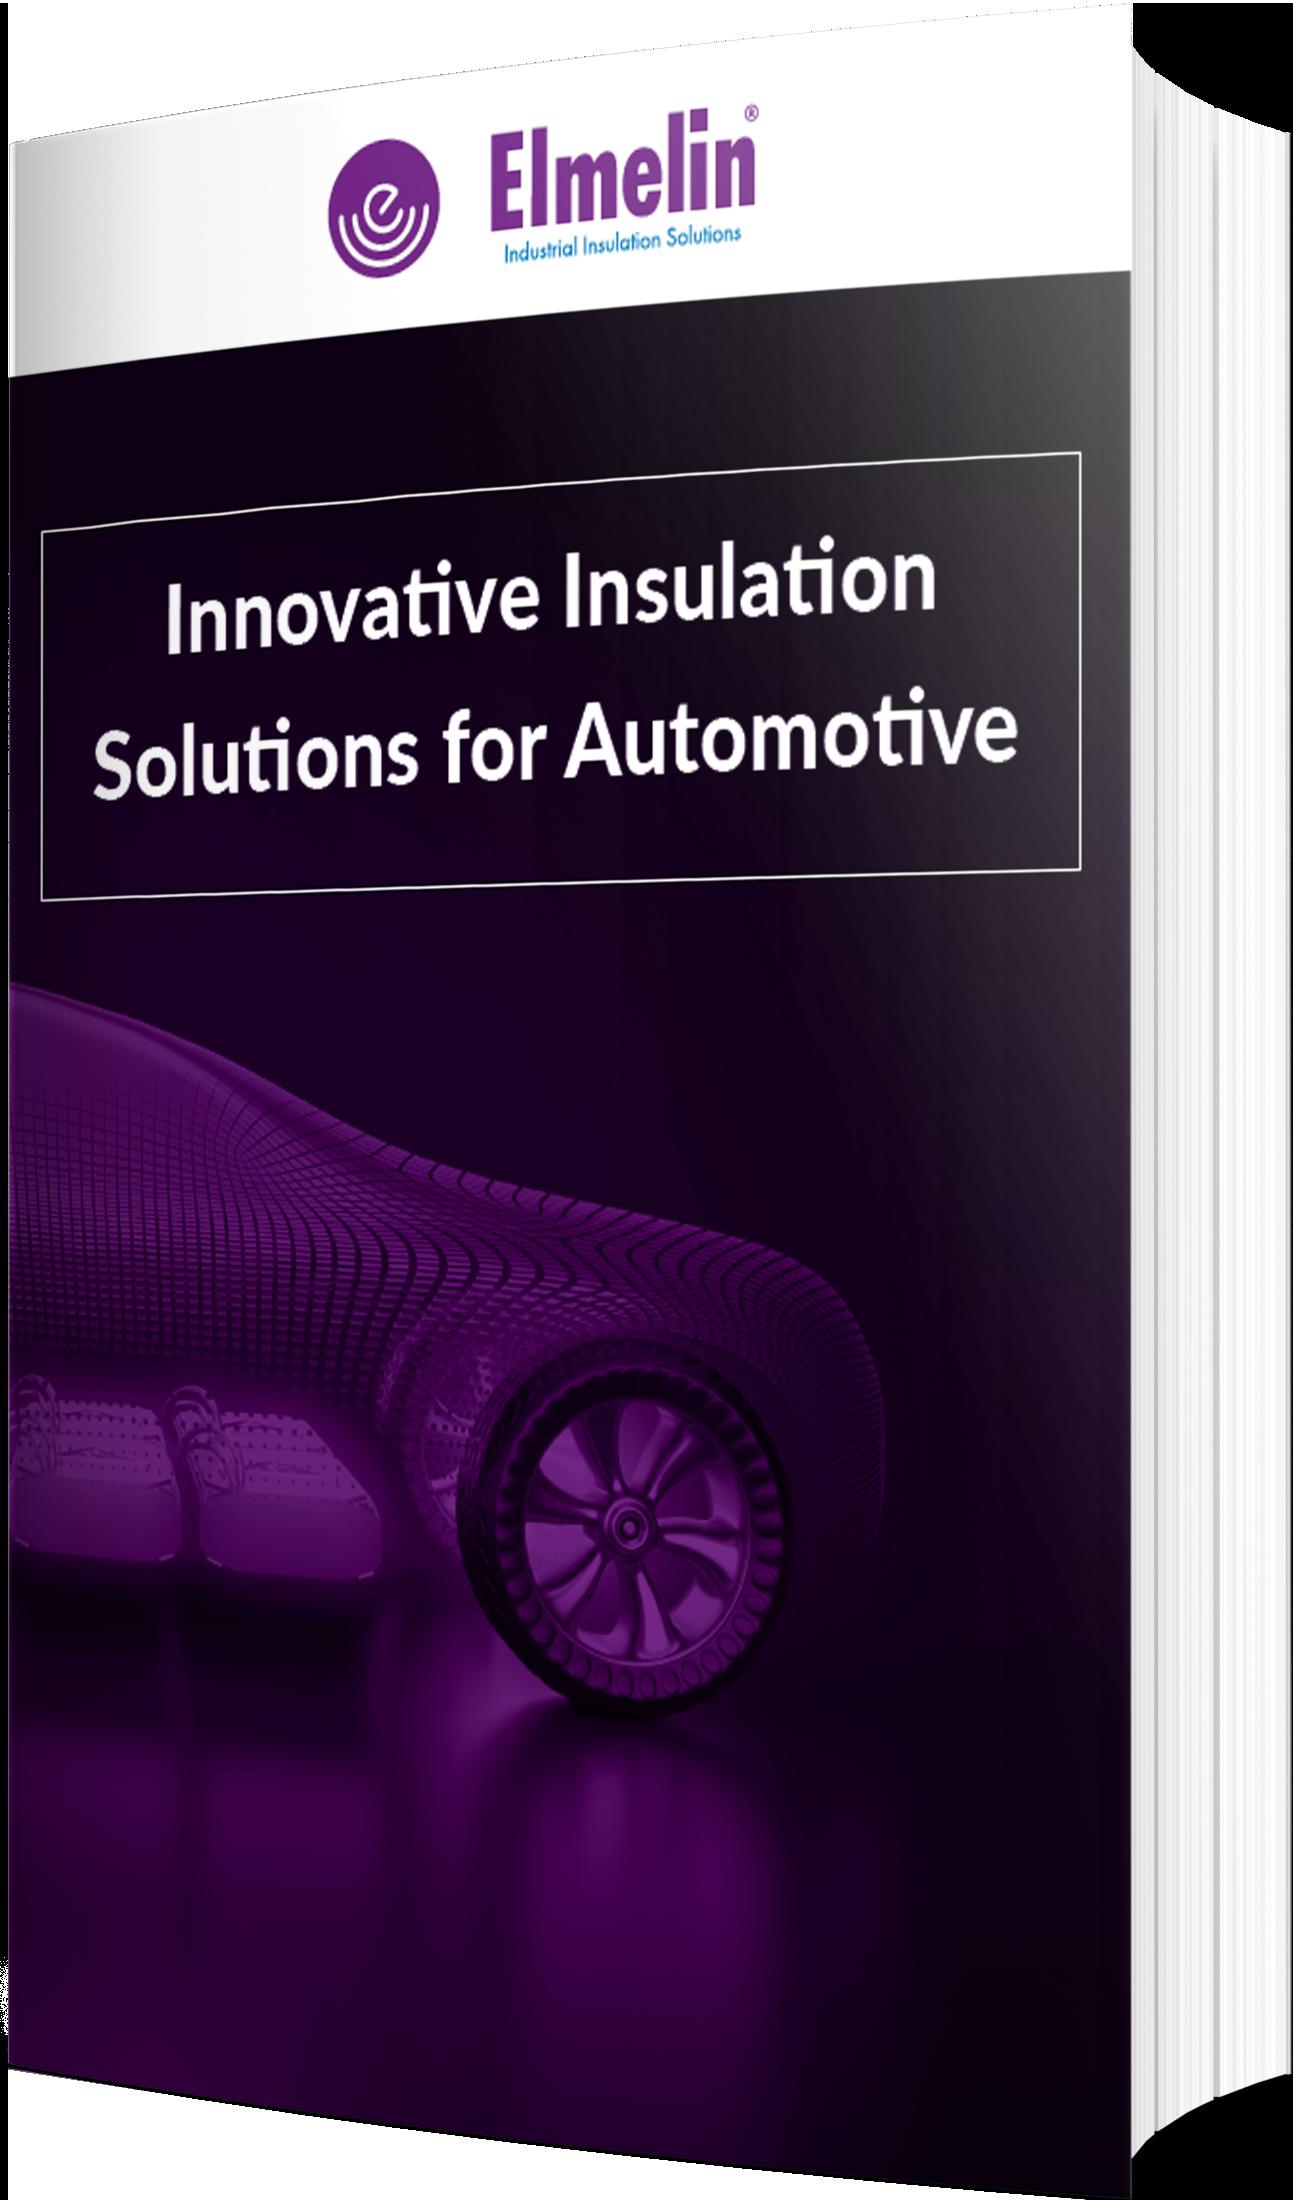 Elmelin Solutions for Automotive